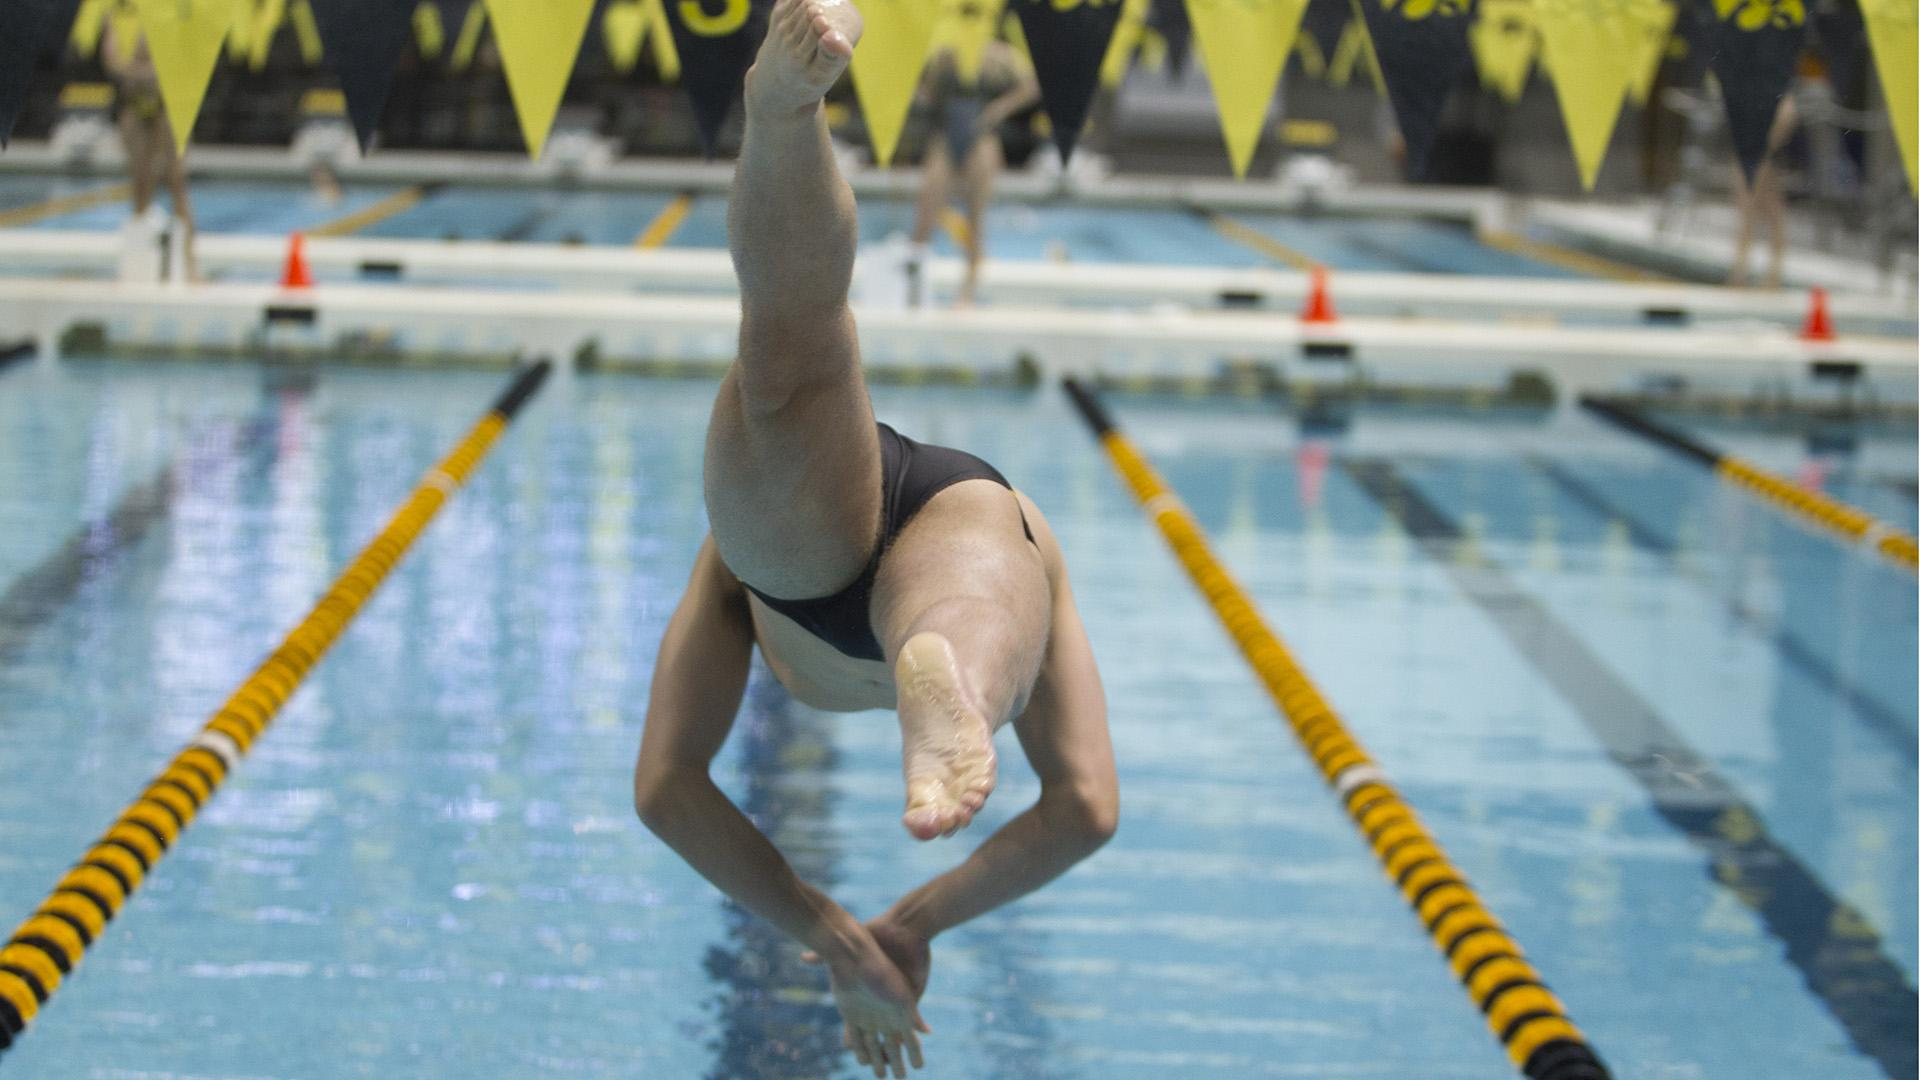 The University of Iowa mens' swimming fifth in Big Tens